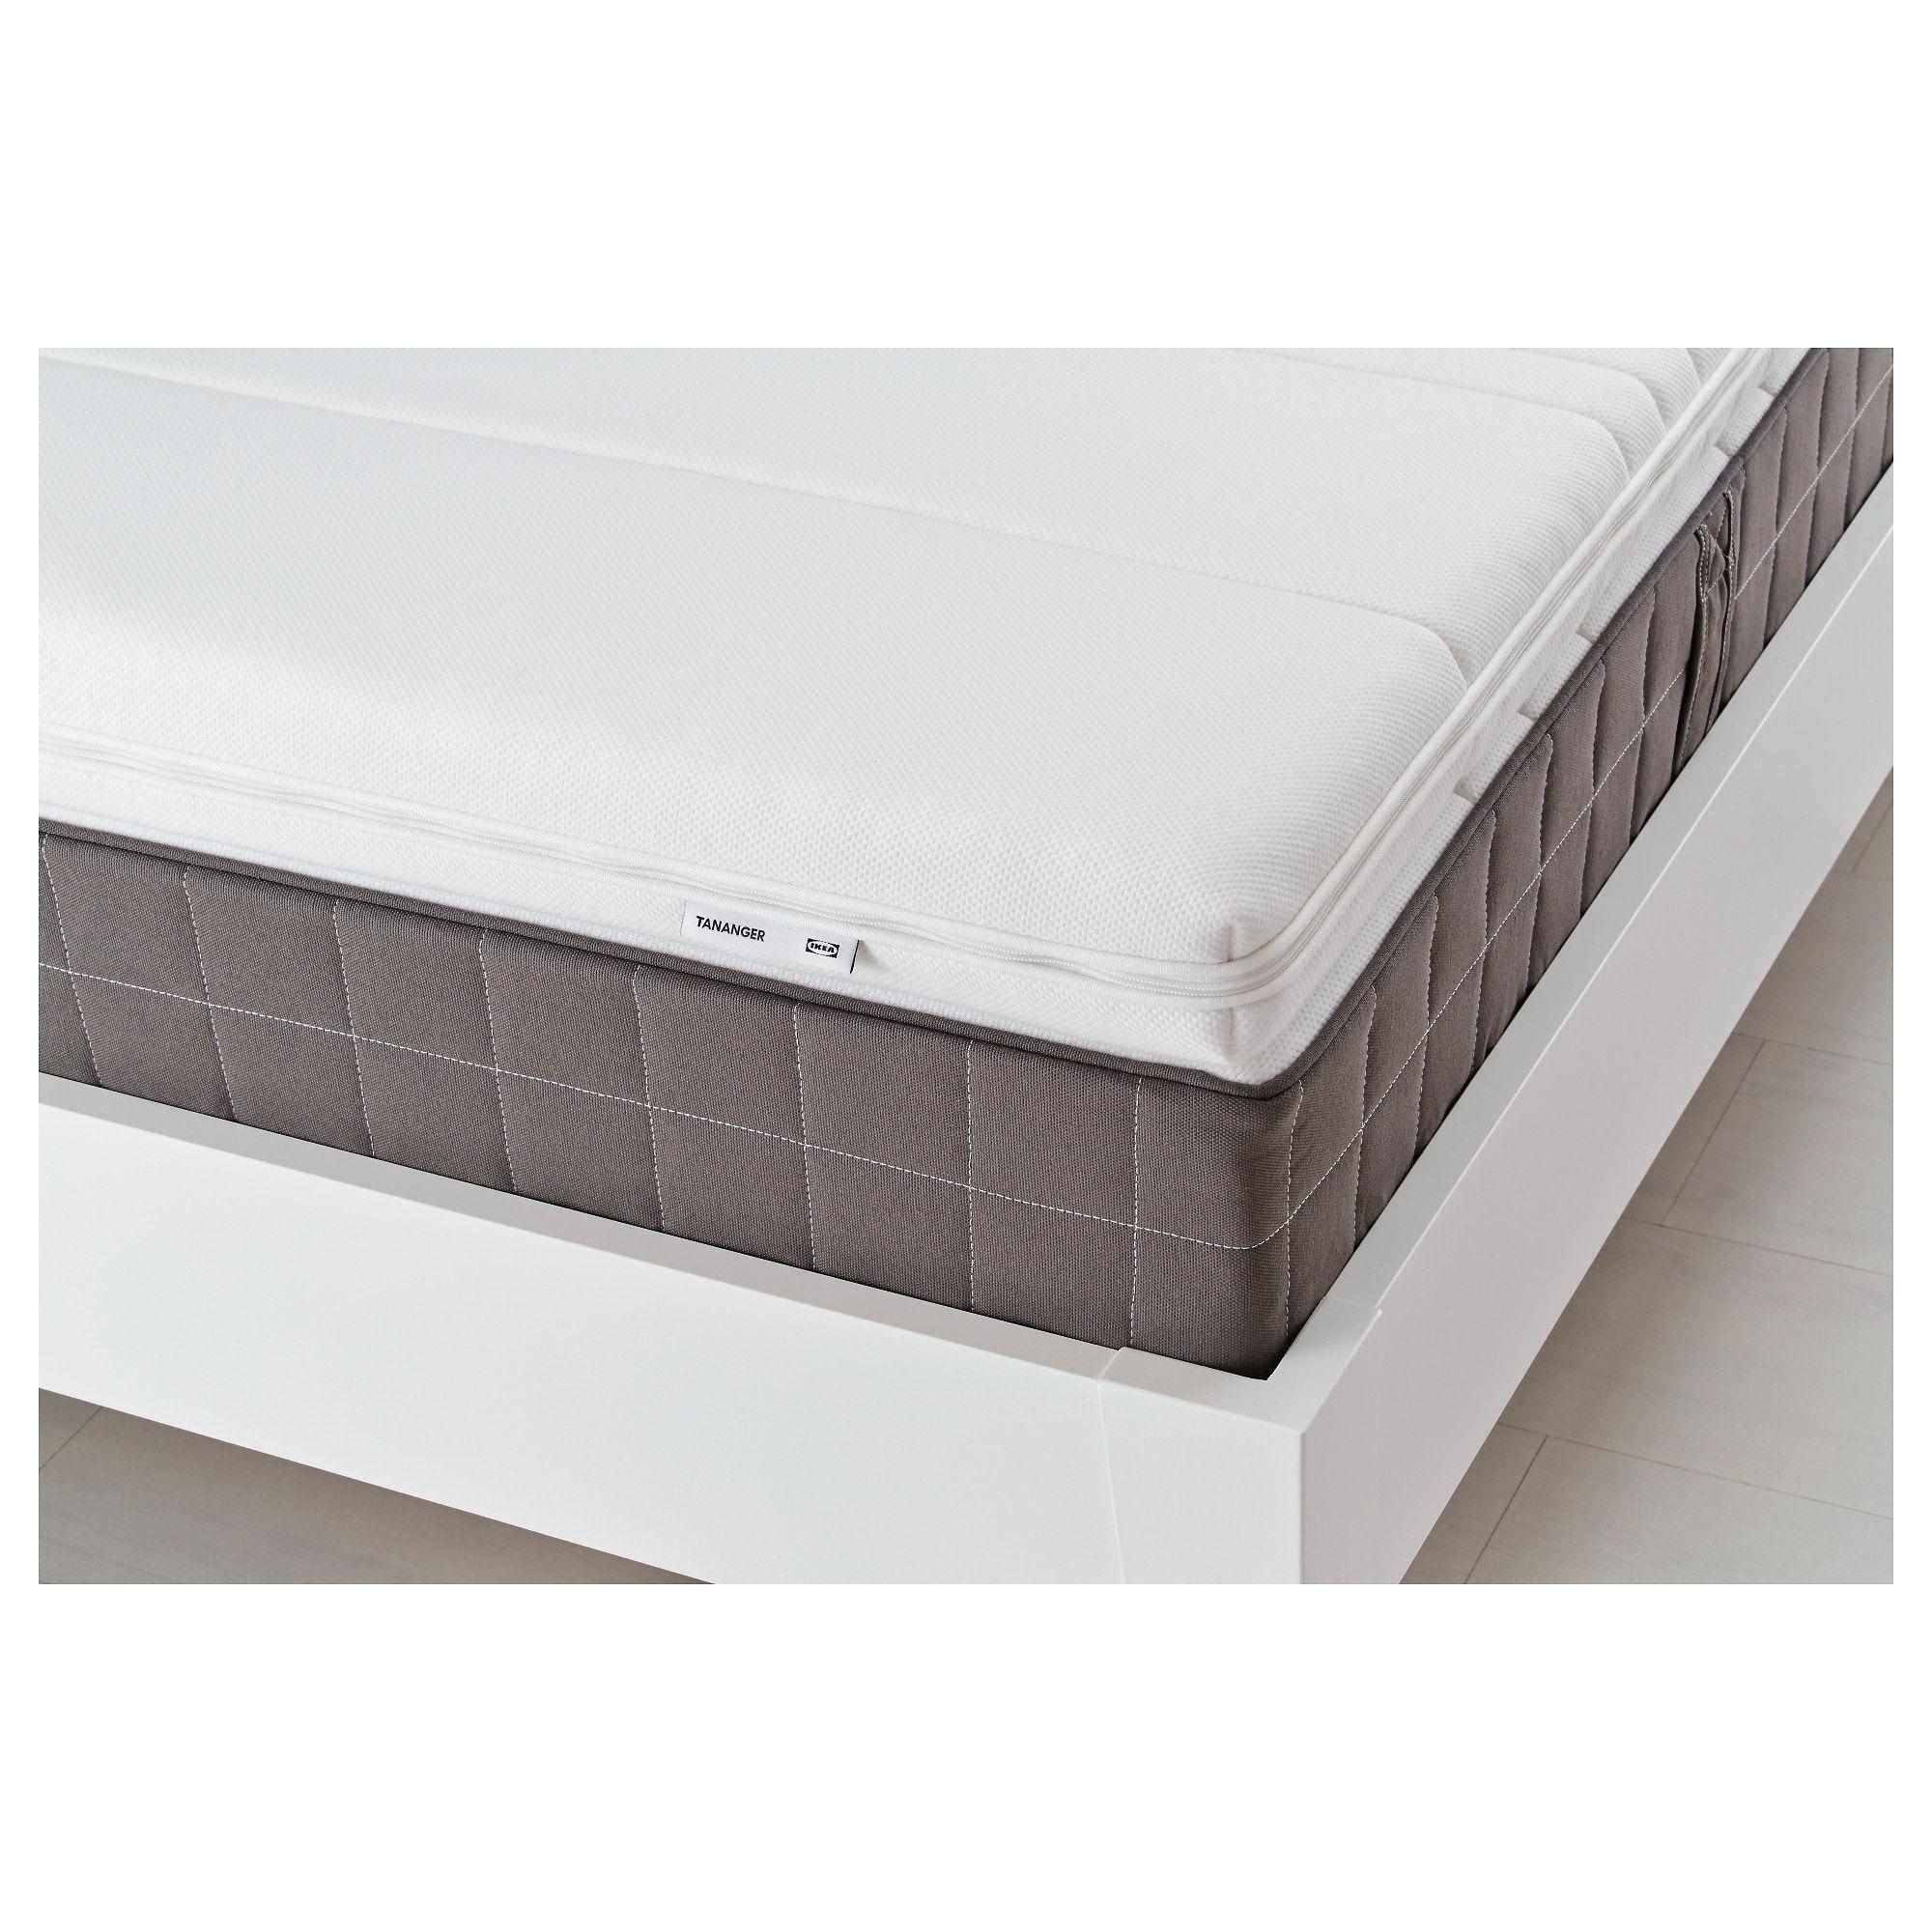 Ikea Tananger White Mattress Topper In 2020 Mattress Ikea